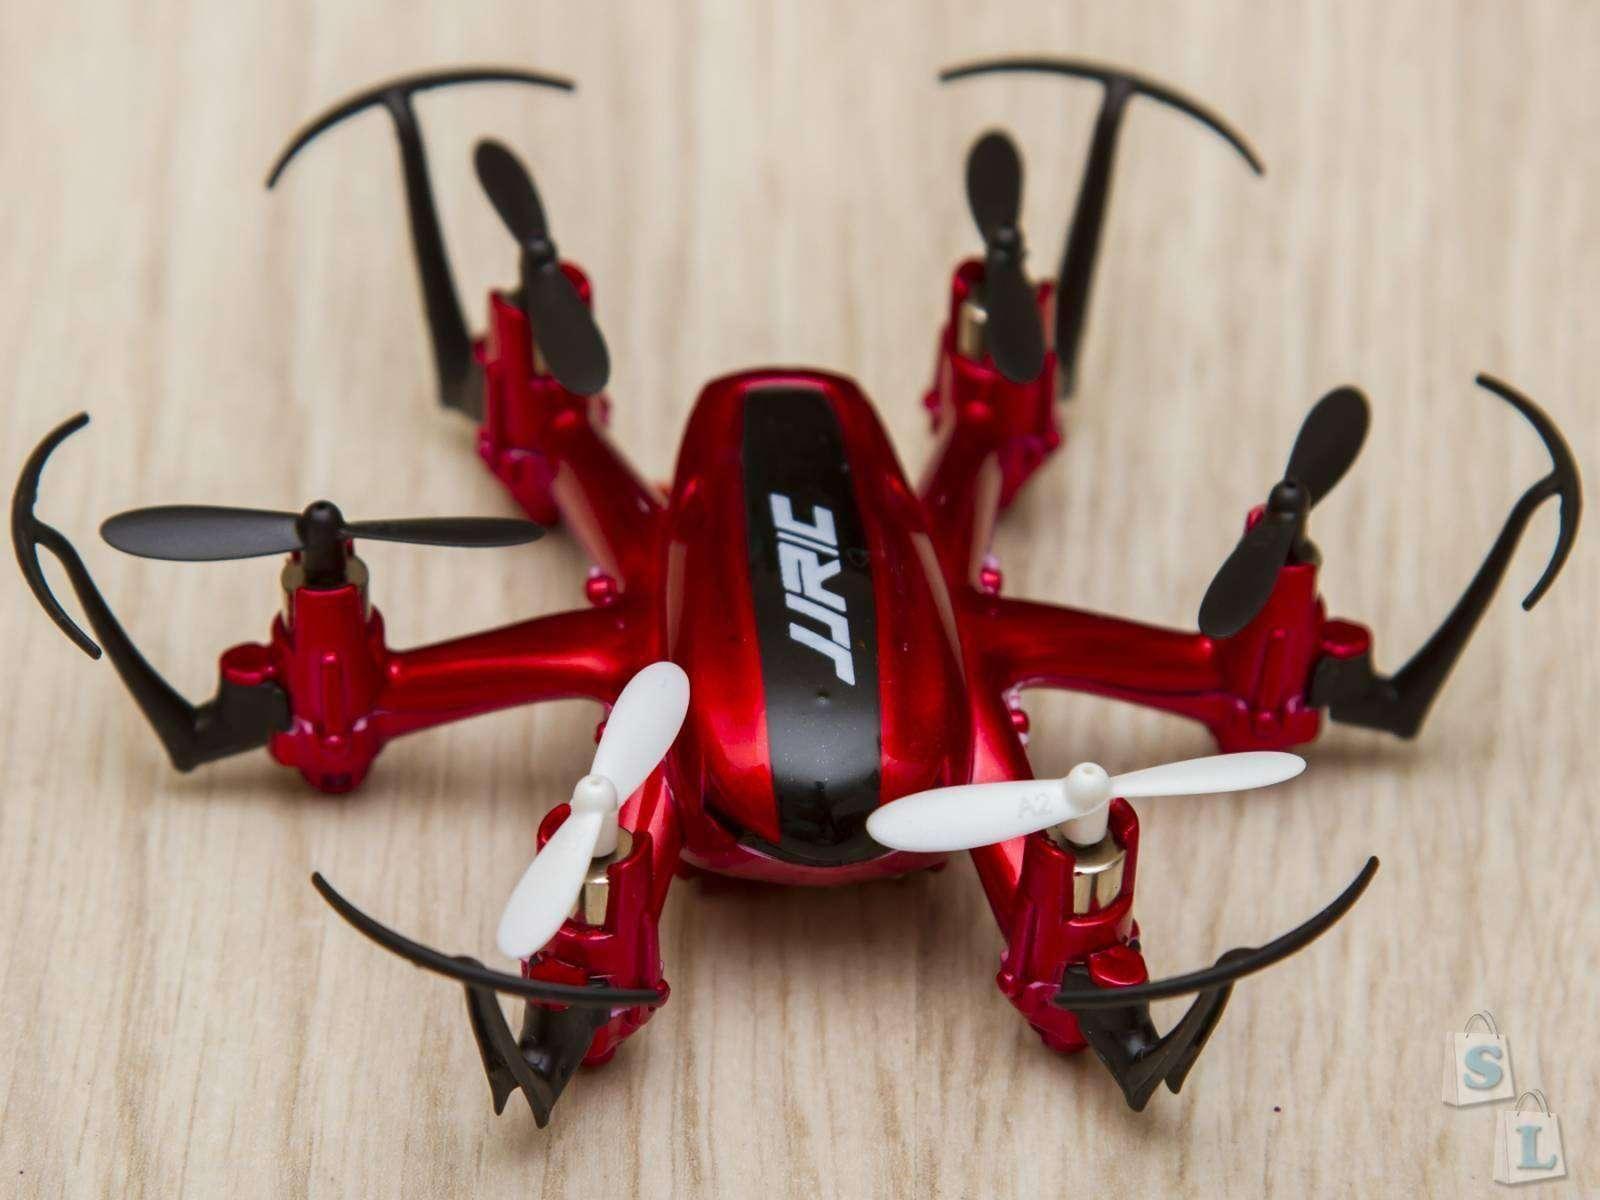 GearBest: Гексакоптер JJRC H20 - комплектация и внешний вид